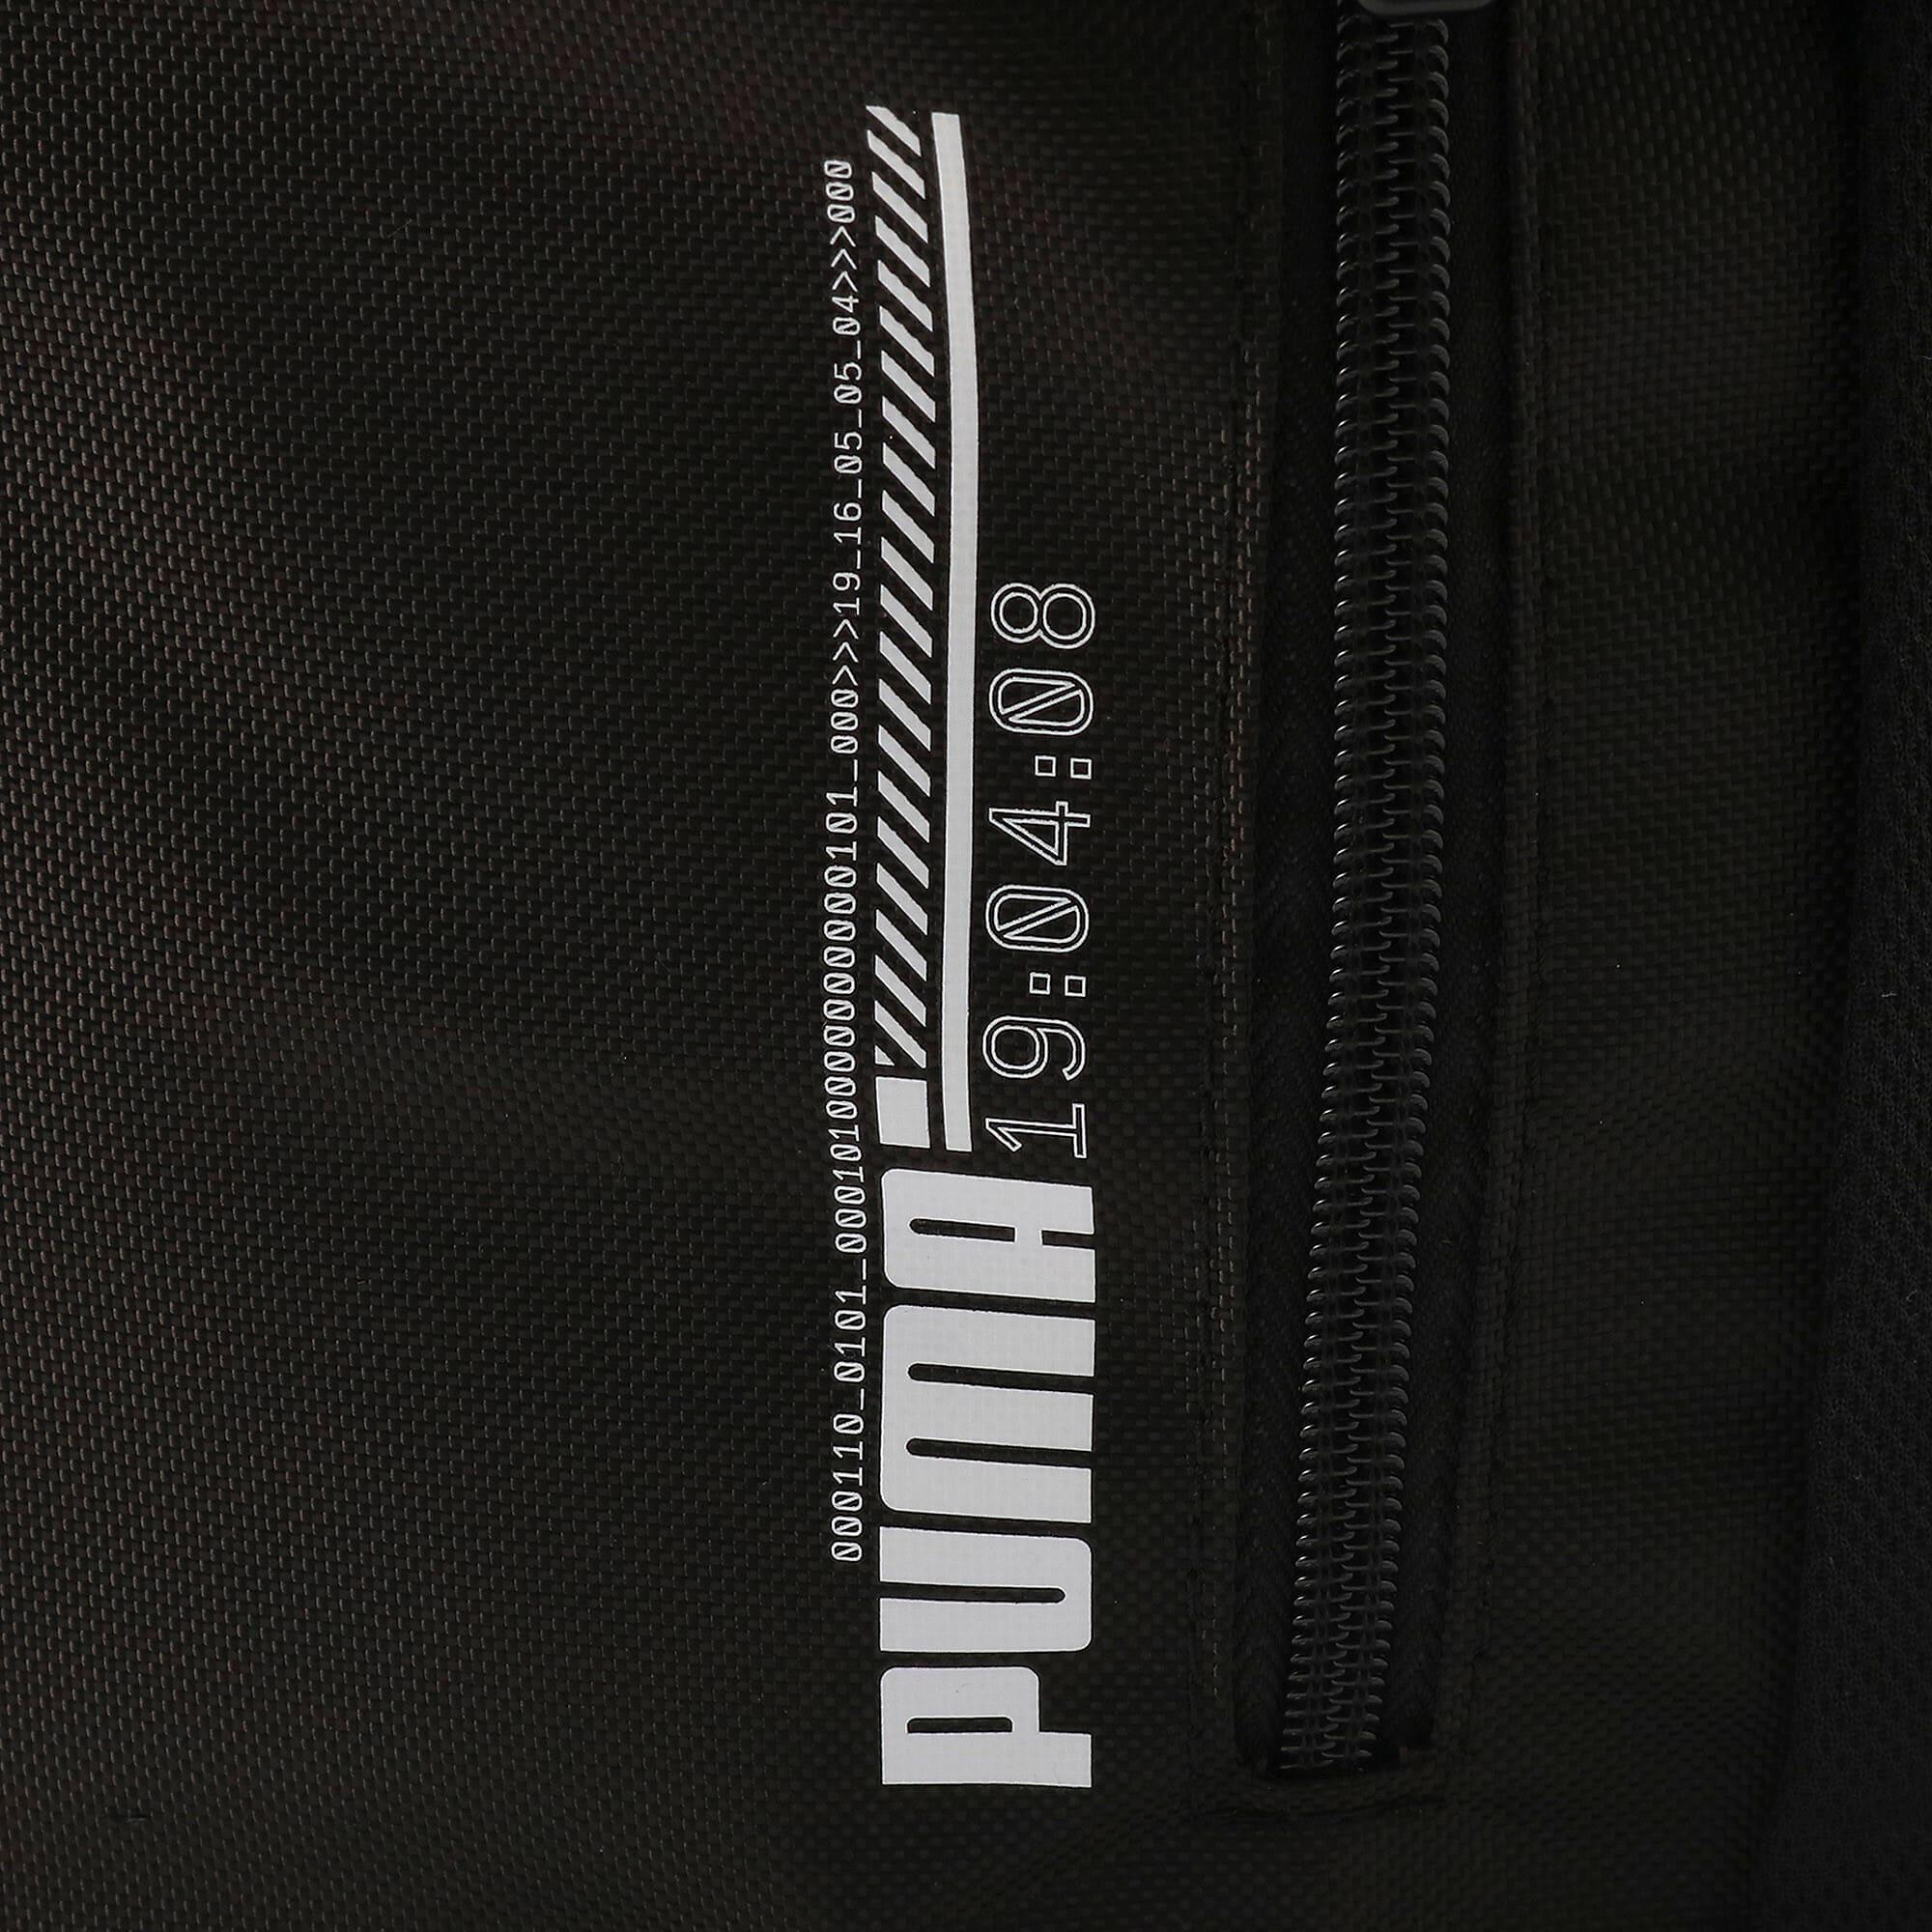 Thumbnail 5 of エナジー ロールトップ バックパック 18L, Puma Black, medium-JPN